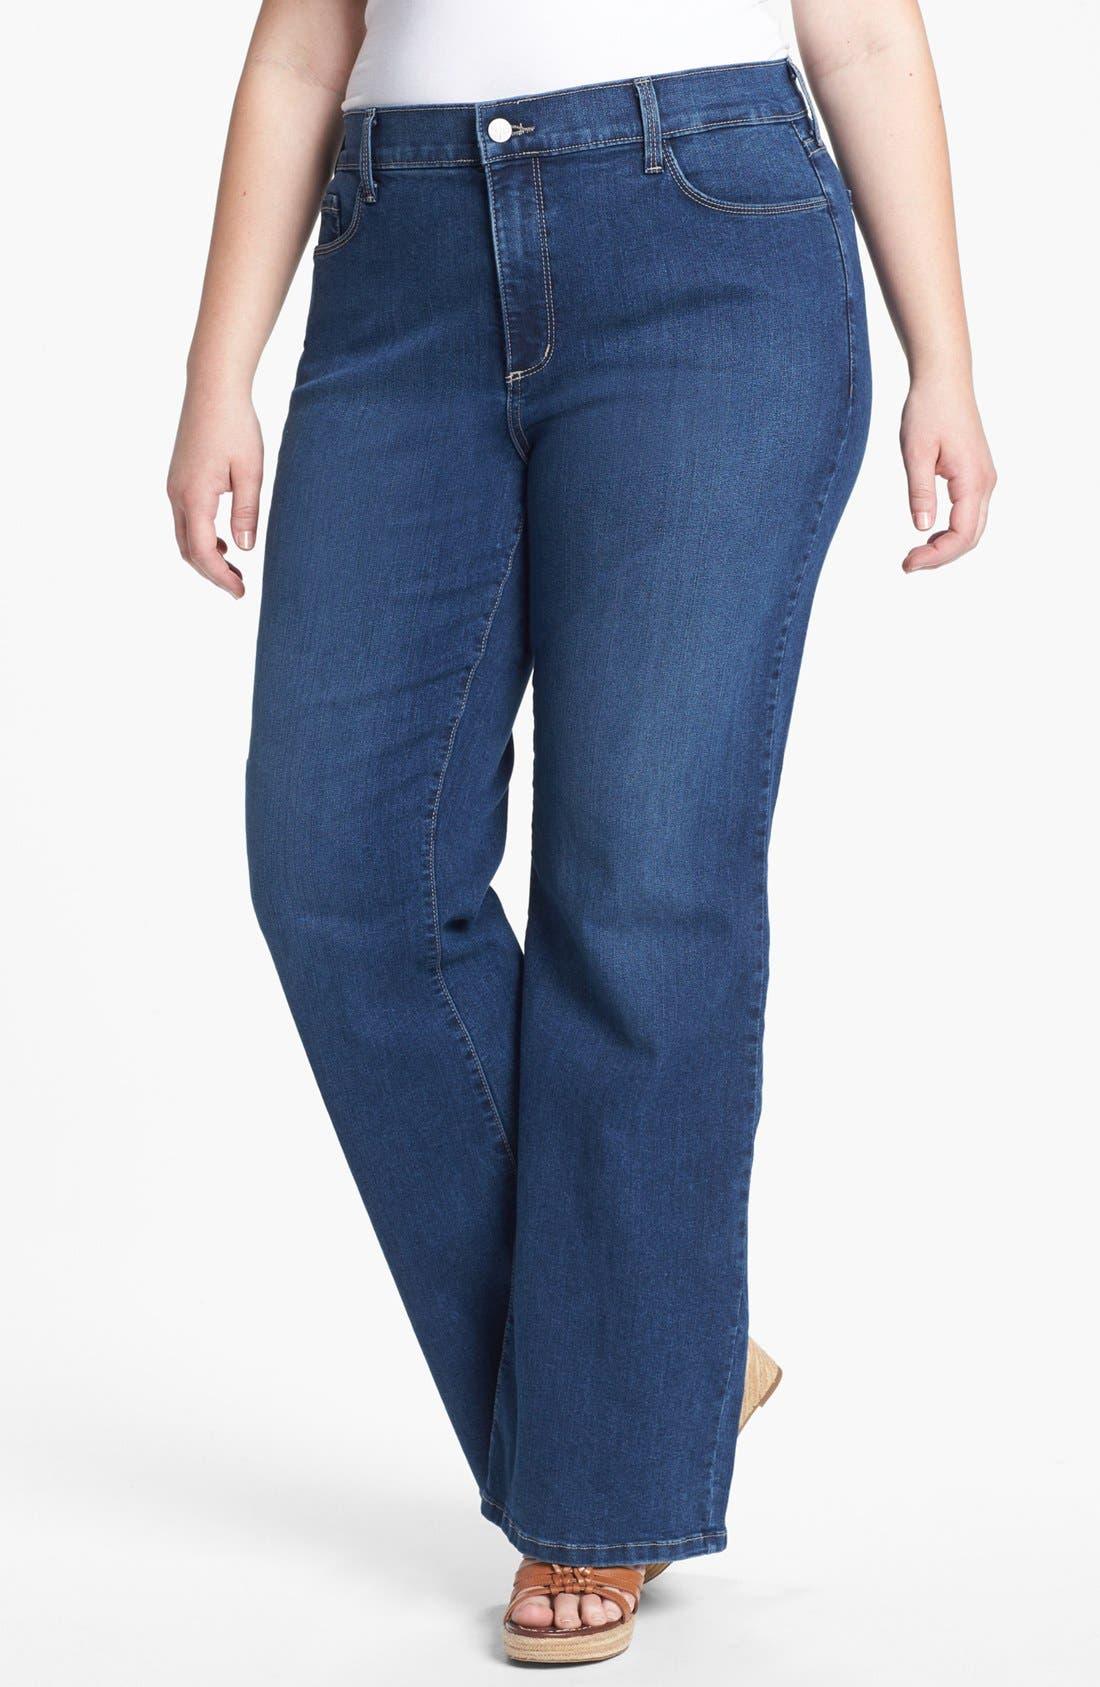 Alternate Image 1 Selected - NYDJ 'Sarah' Bootcut Jeans (Plus Size)